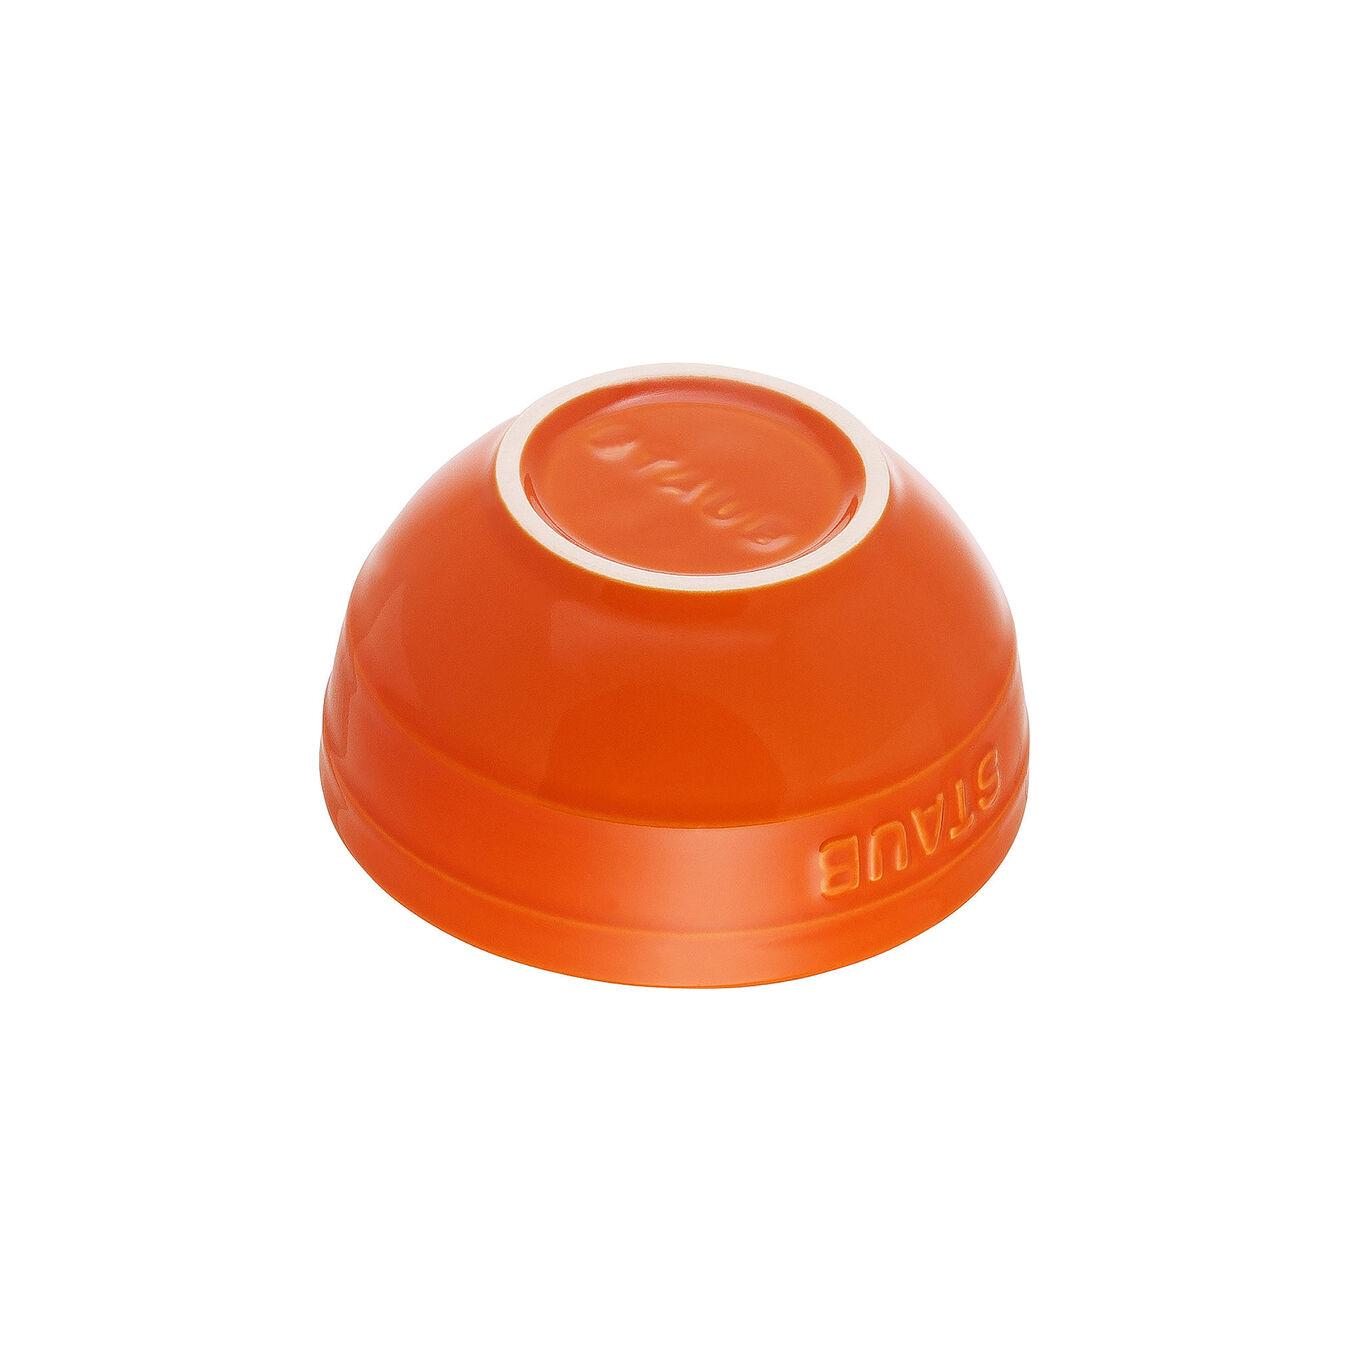 Ciotola rotonda - 12 cm, arancione,,large 2